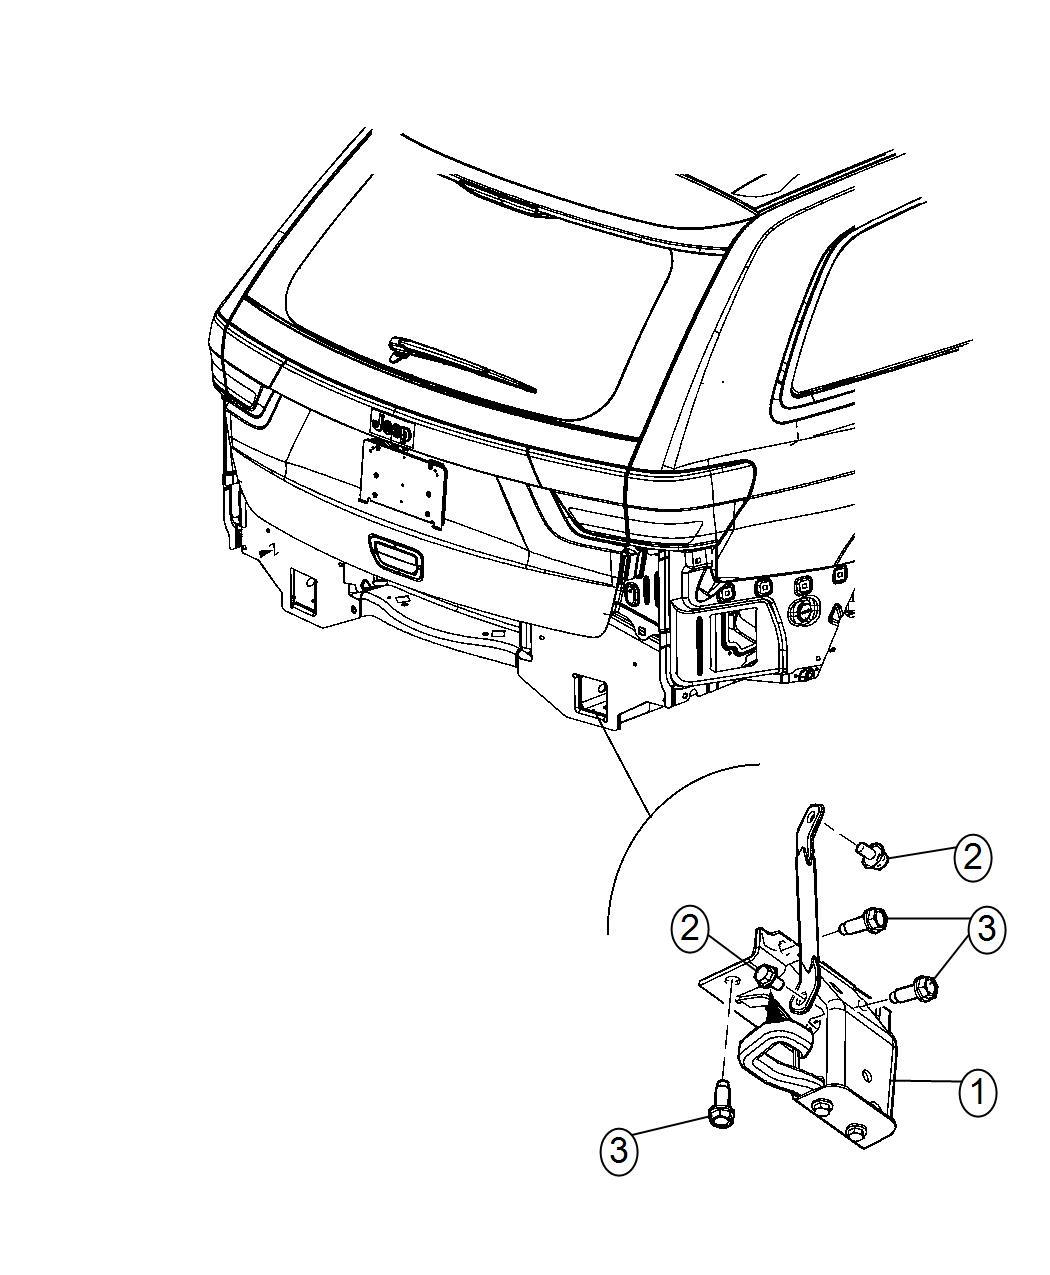 2020 Jeep Grand Cherokee Hook. Tow. [tow hooks], [tow